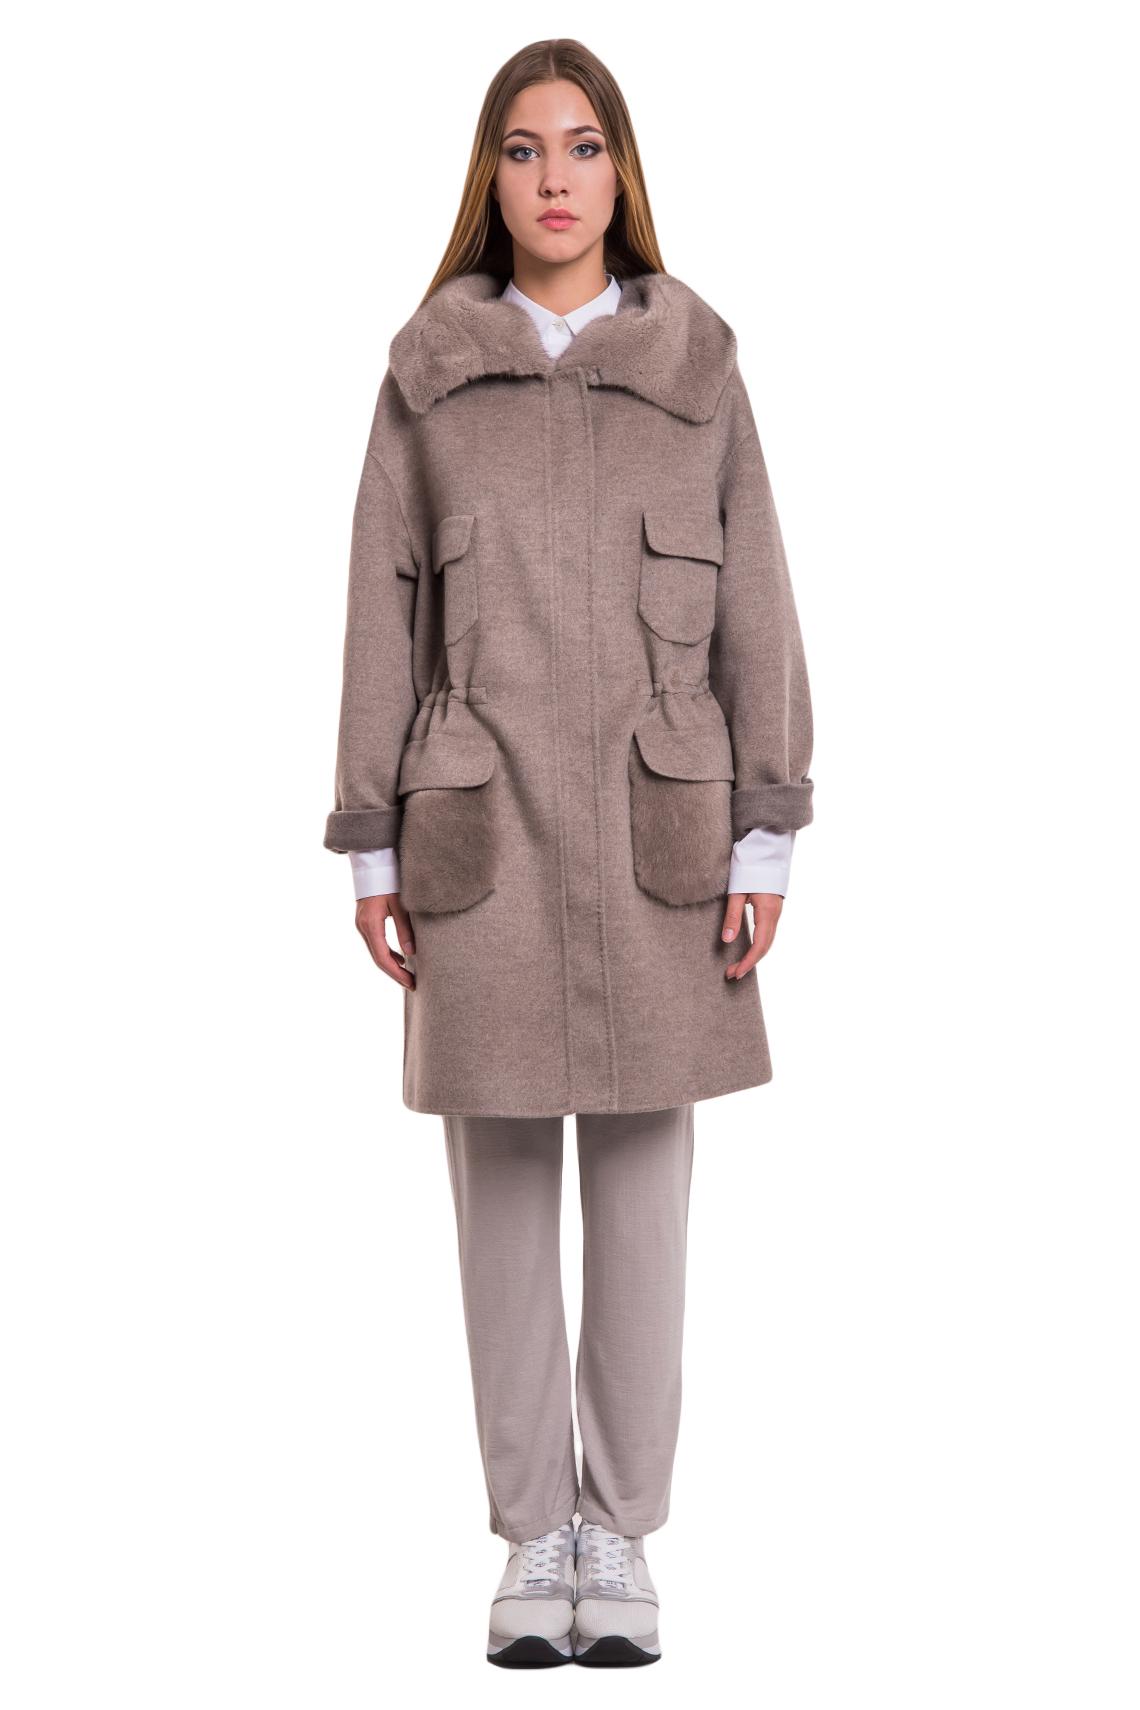 Пальто Manzoni24 кашемир/silver grey норка арт.17M120t. Фото 1